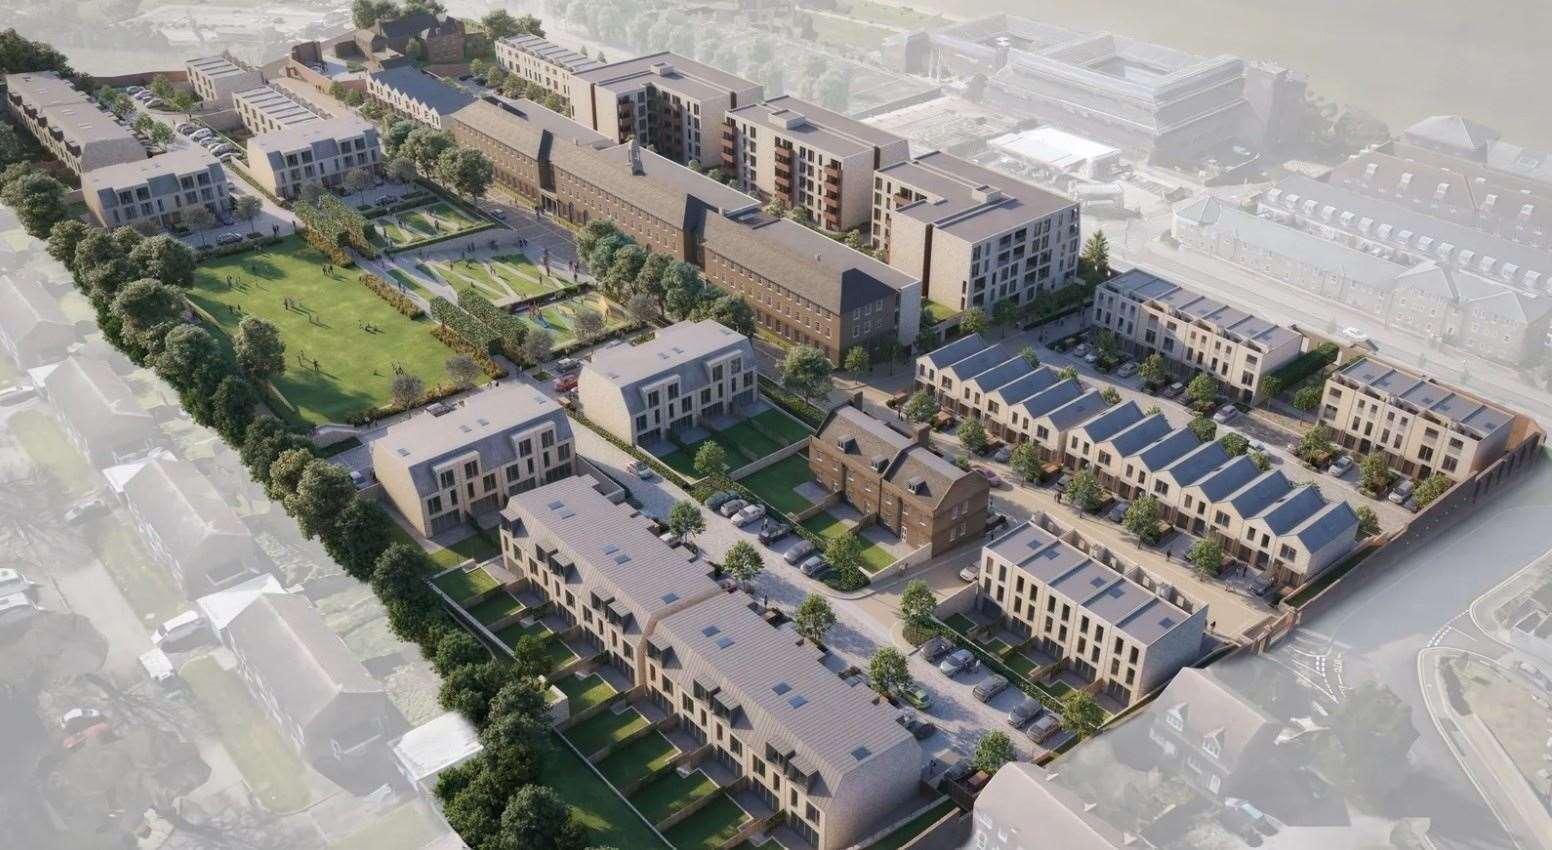 CGI of the Kitchener Barracks development. Picture: Zoopla / Kitchener Barracks